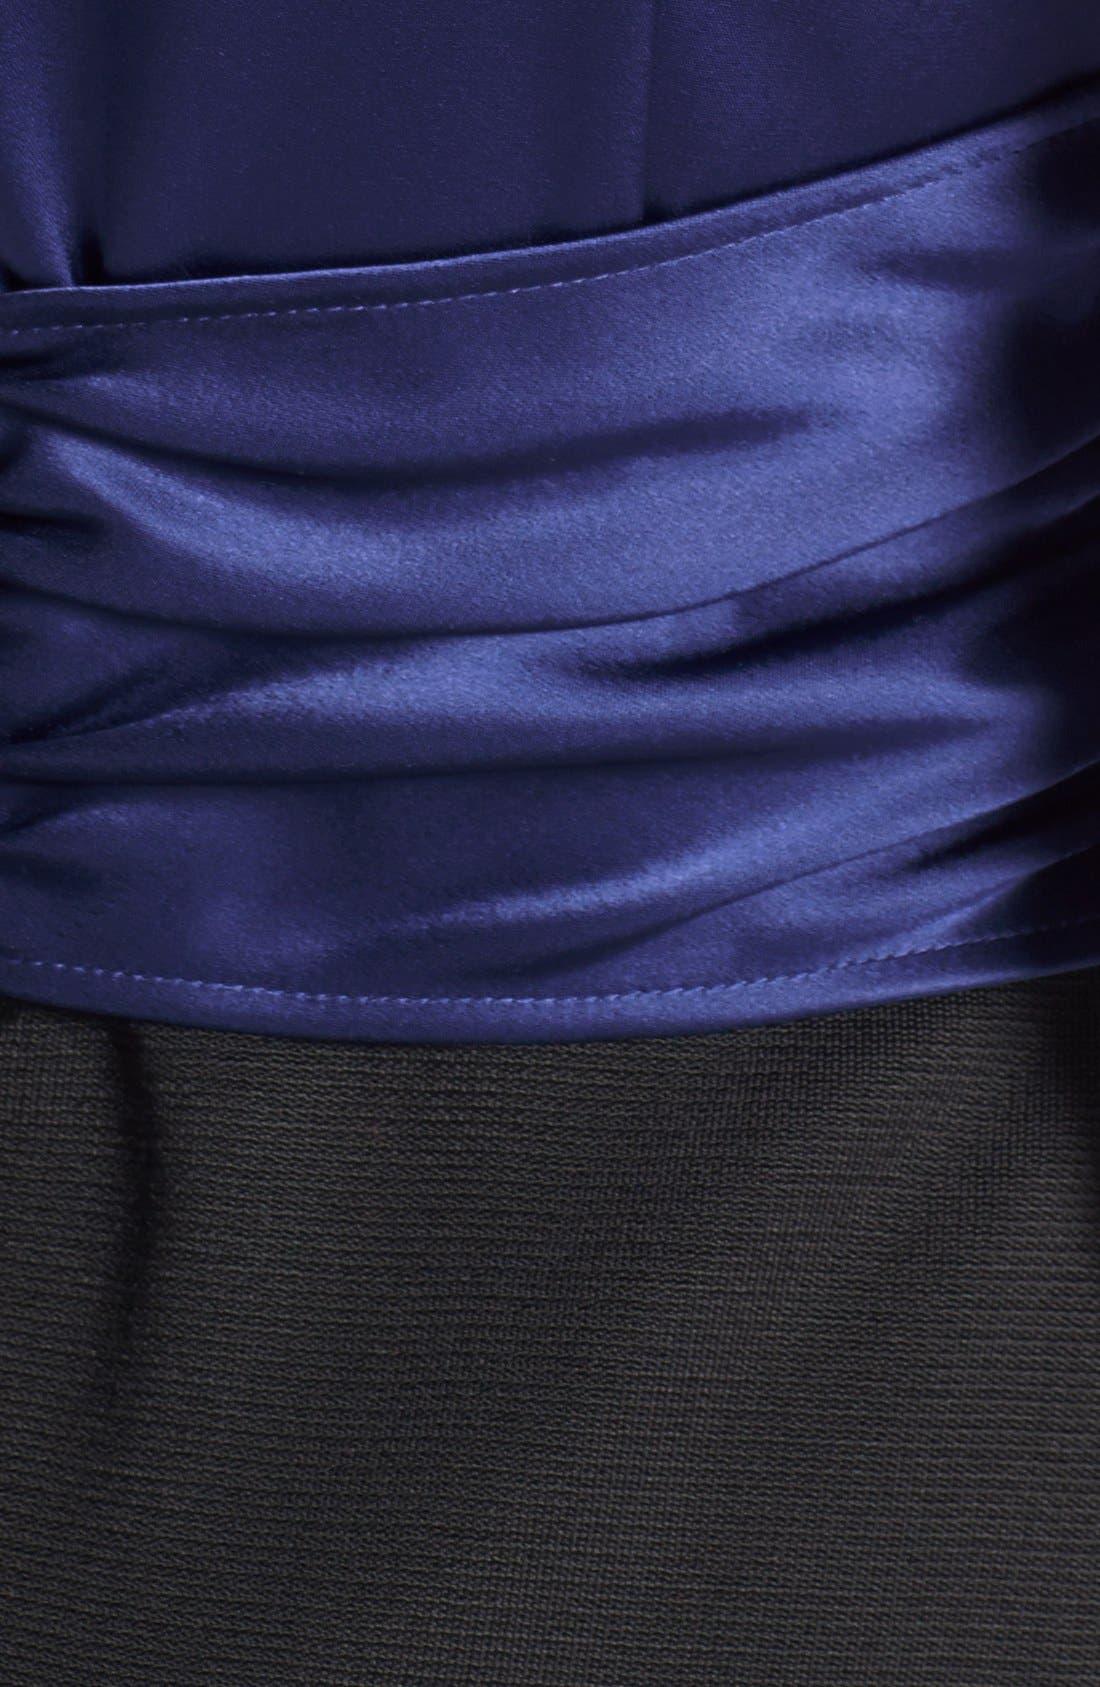 Alternate Image 3  - St. John Collection Embellished Liquid Satin & Milano Knit Dress